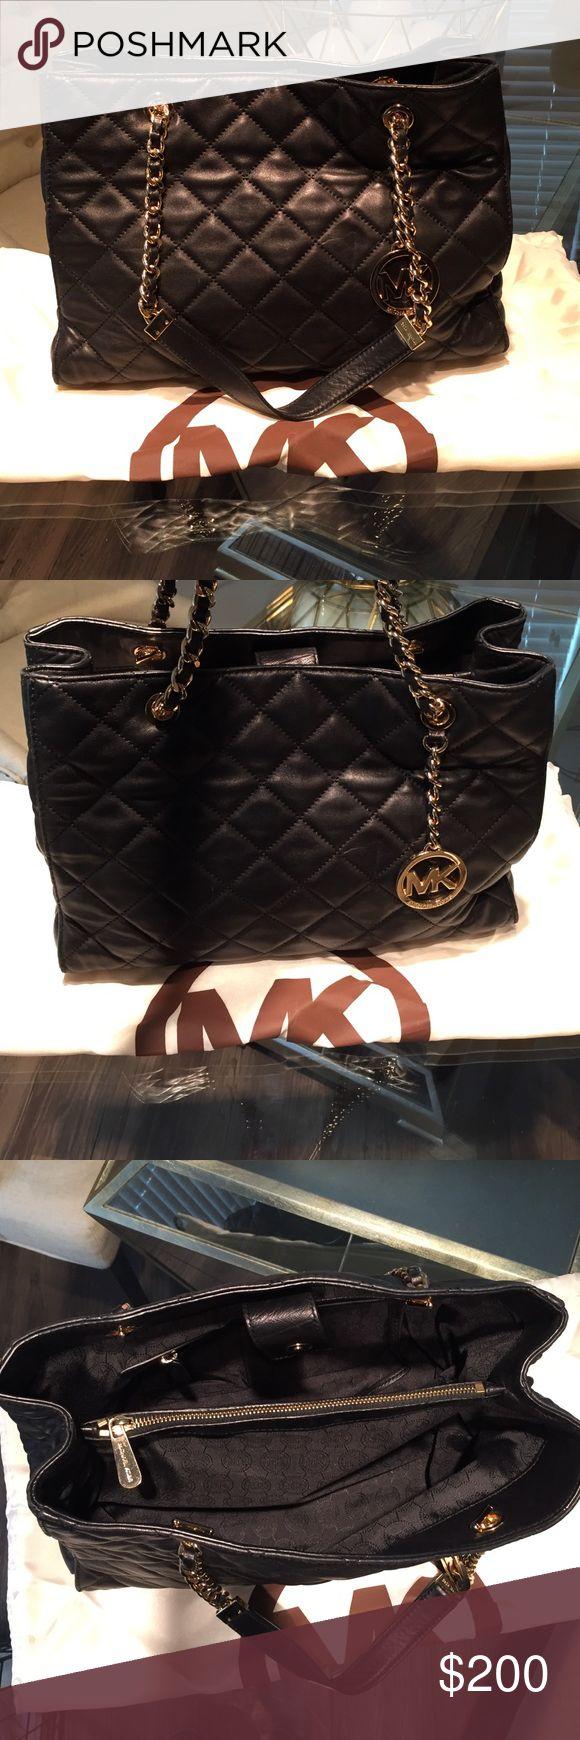 Michael Kors Susannah Black quilted shoulder bag. Lamb skin leather. Great condition MICHAEL Michael Kors Bags Shoulder Bags